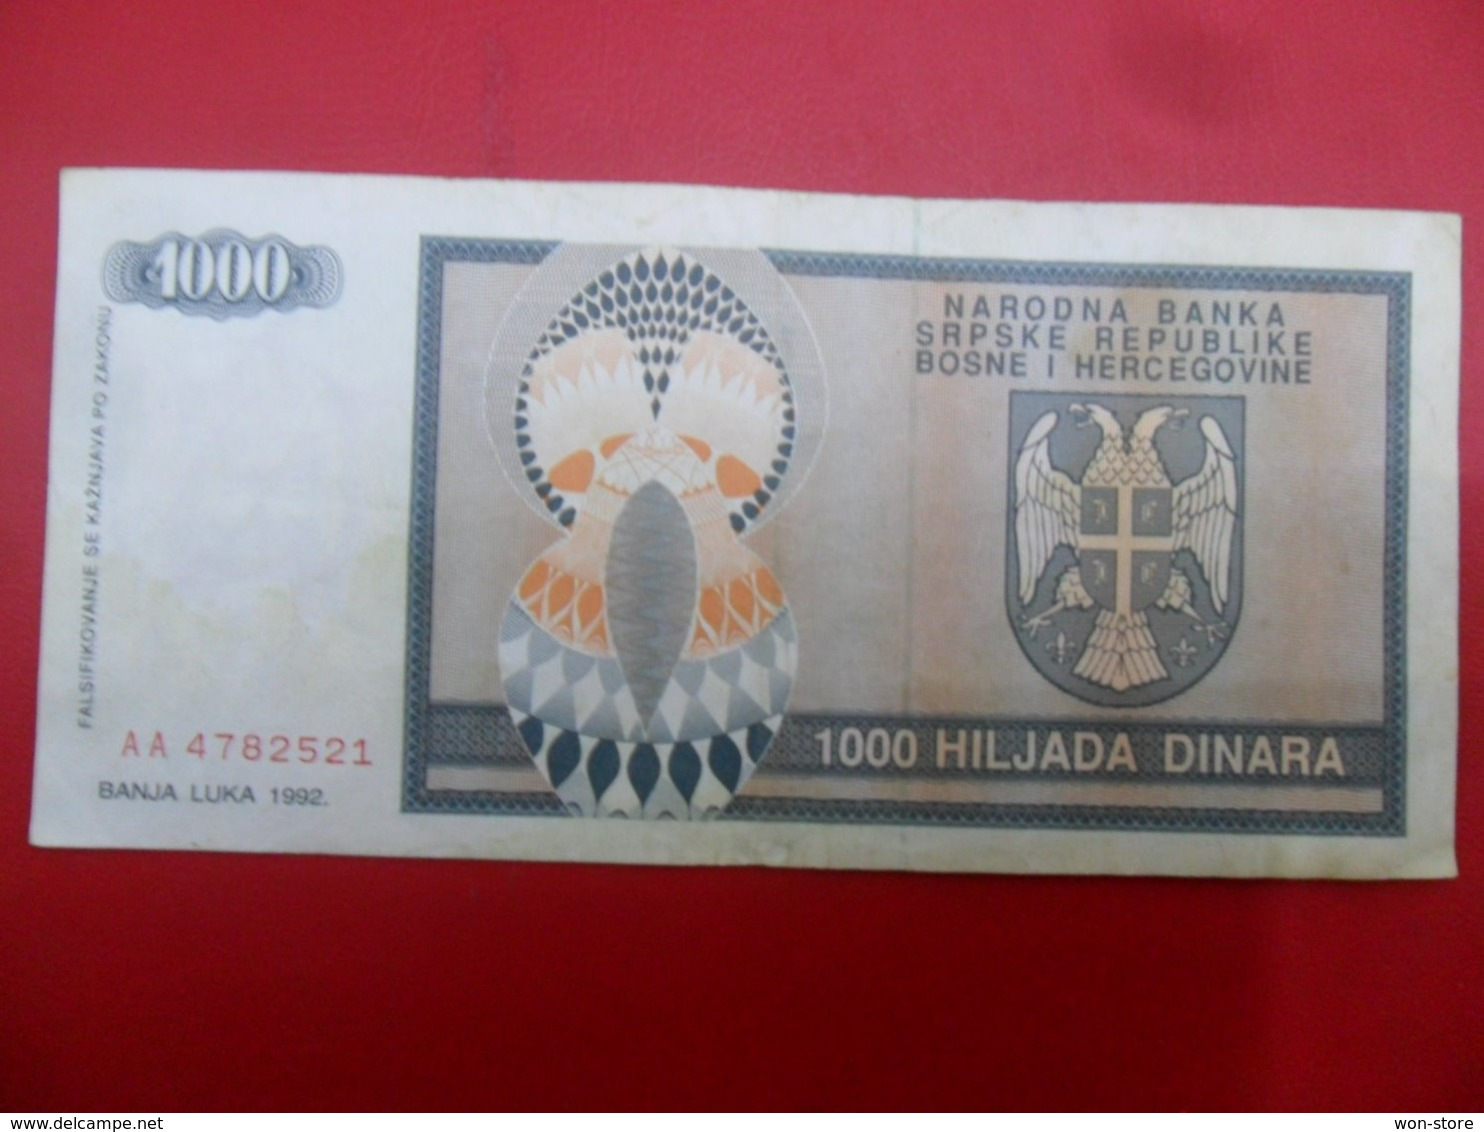 NB Republika Bosna I Hercegovina - Bosnia And Herzegovina 1000 Dinara 1992, P-137a, Price For 1 Pcs - Bosnia Erzegovina